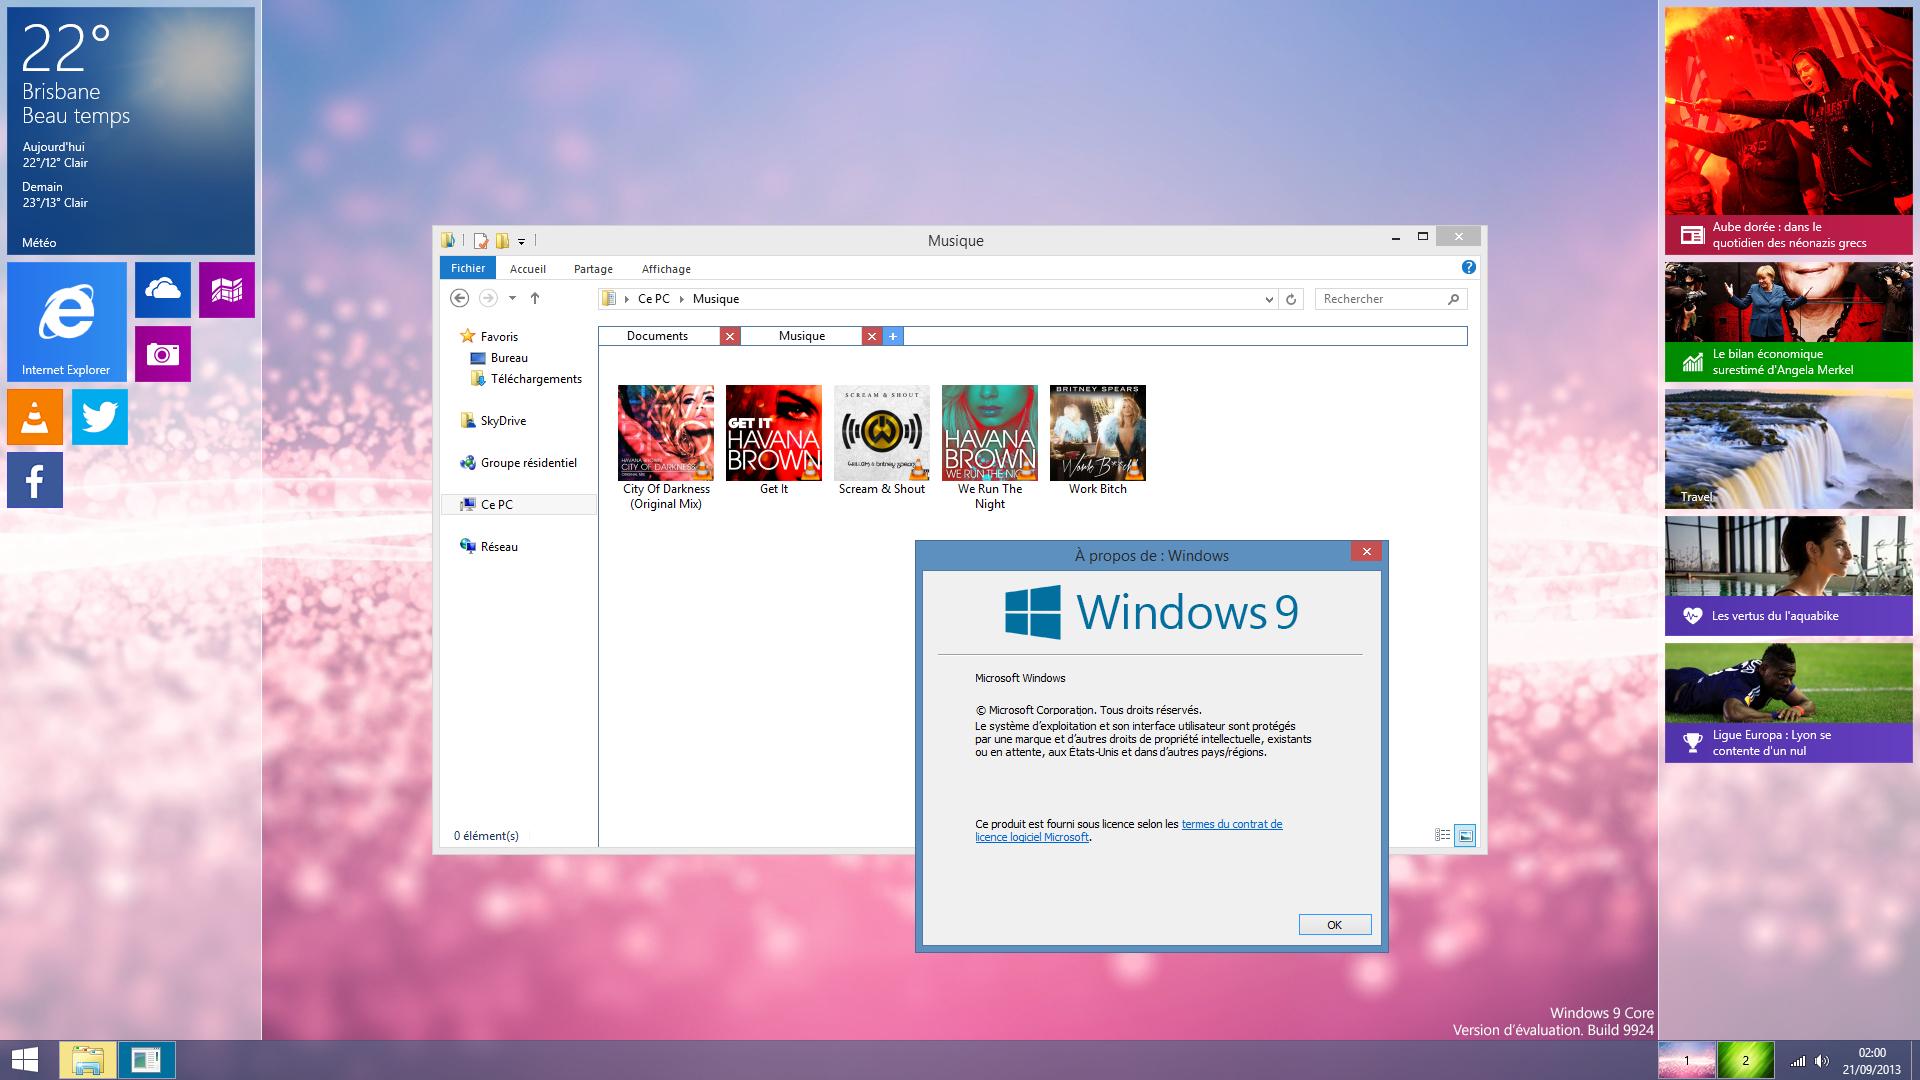 [Design] Windows 9 Core